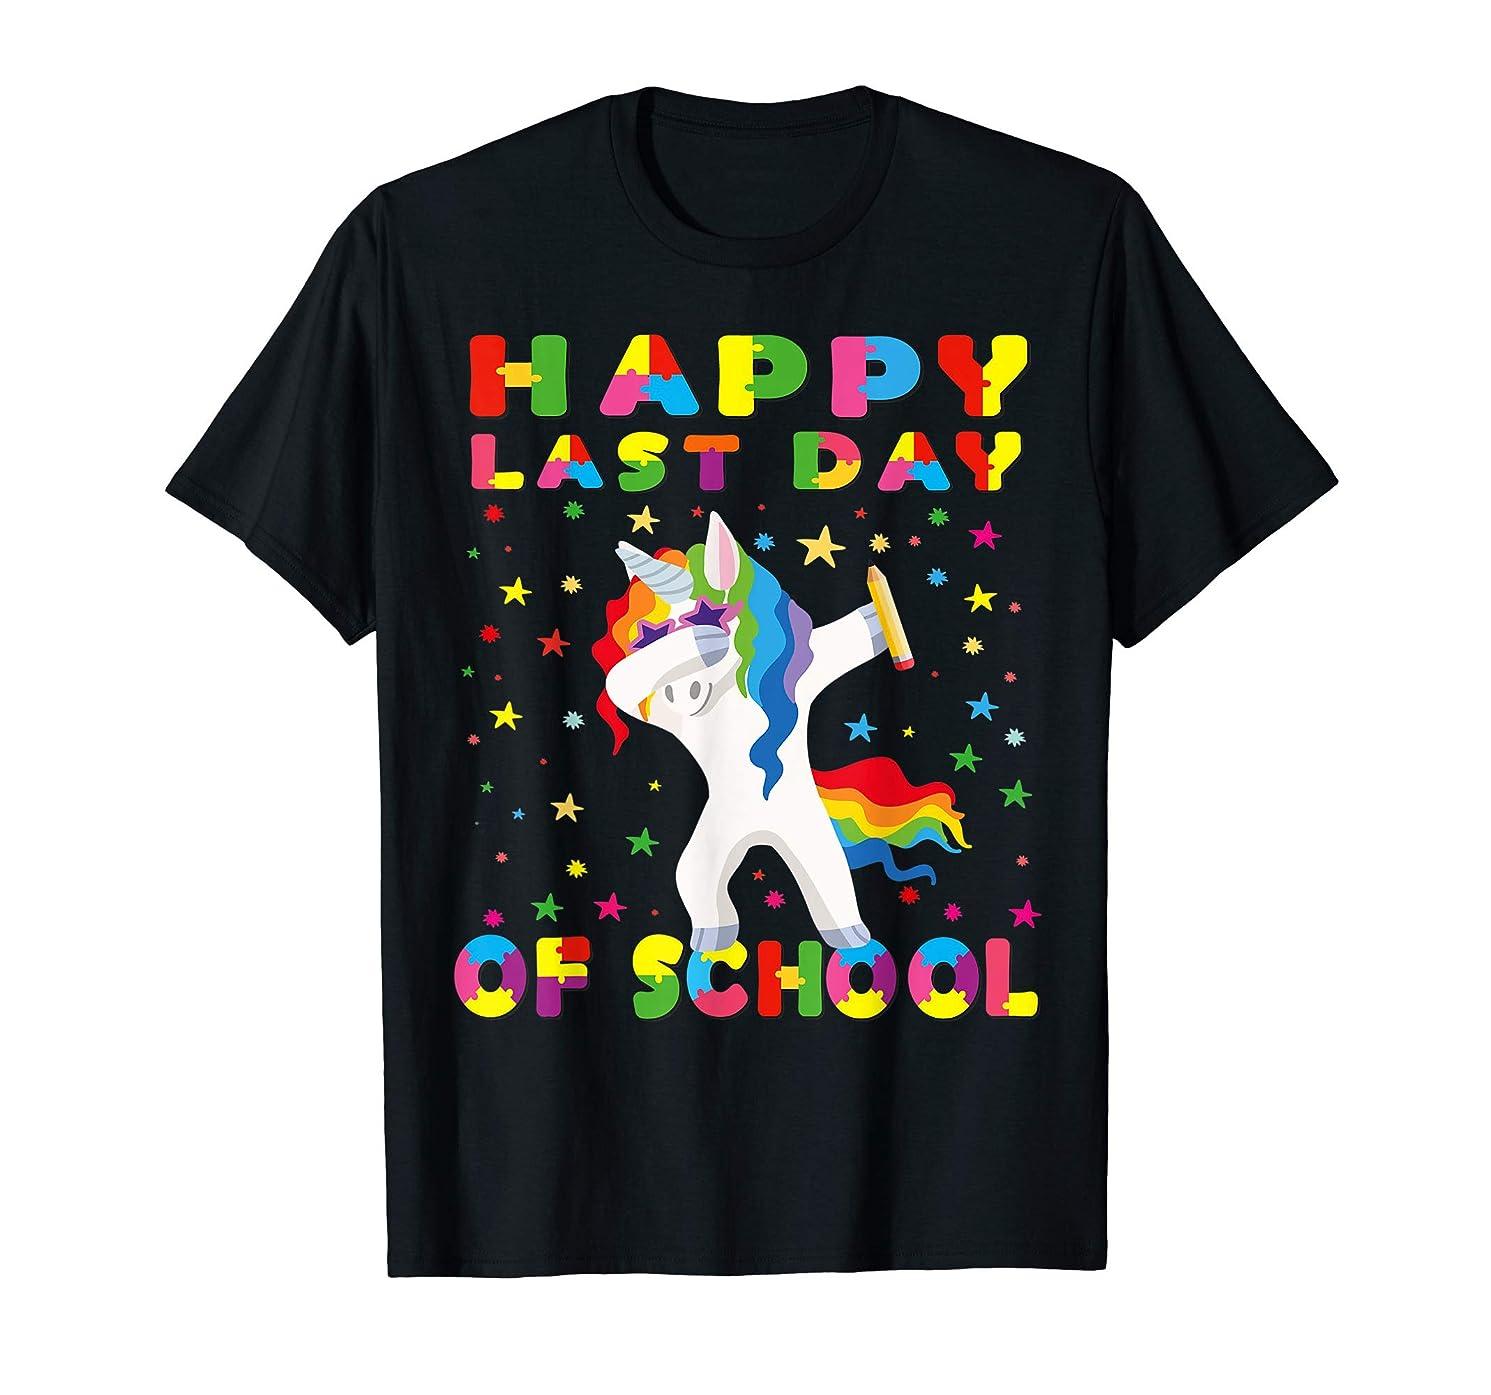 Happy Last Day of School Funny Unicorn Teacher School Gift T-Shirt